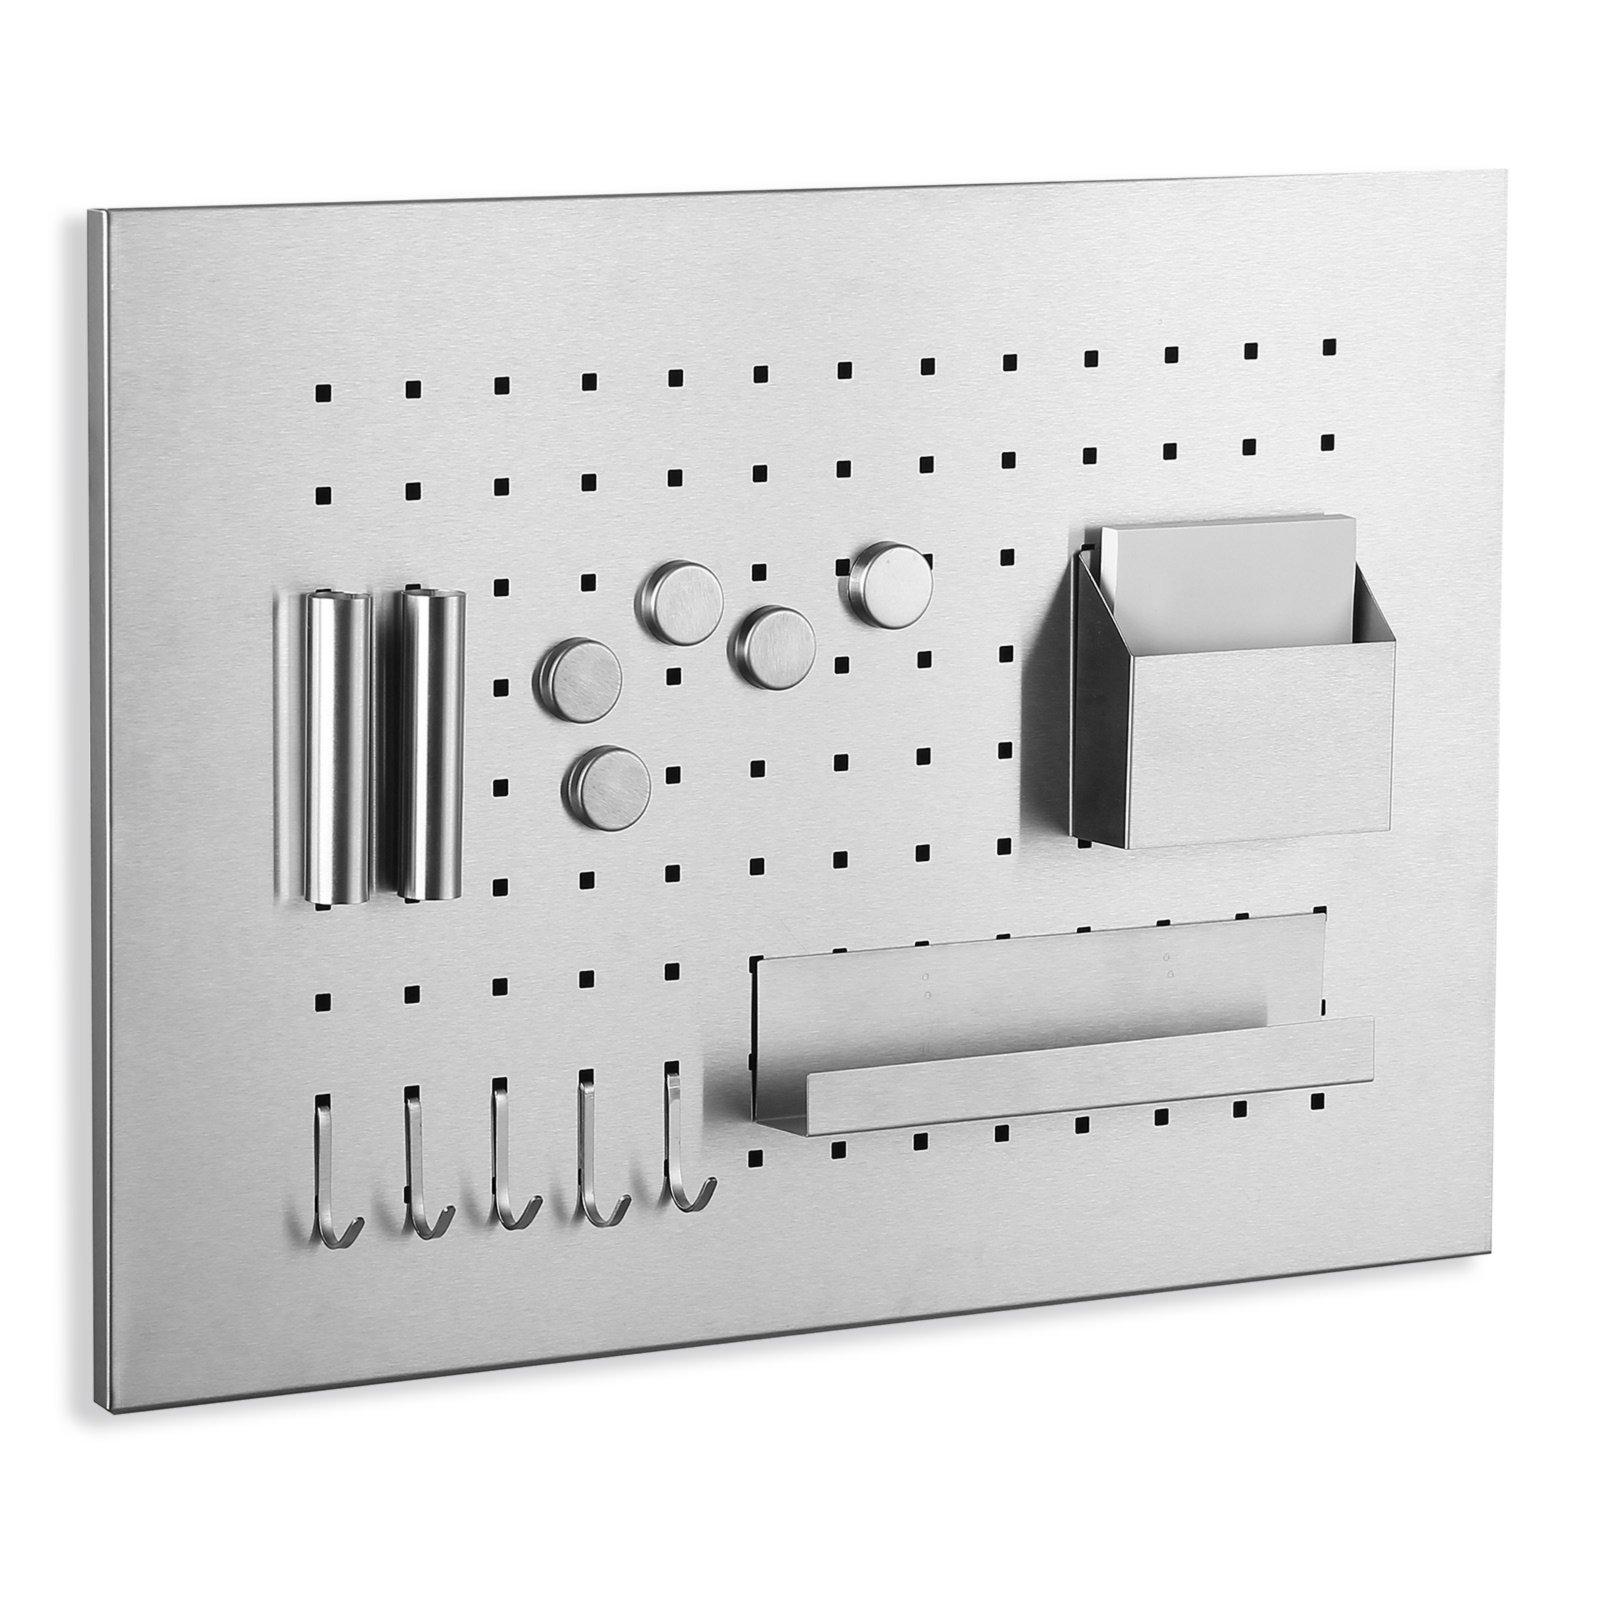 memoboard edelstahl 13 teile 35x50 cm pinnw nde tafeln deko wohnaccessoires. Black Bedroom Furniture Sets. Home Design Ideas